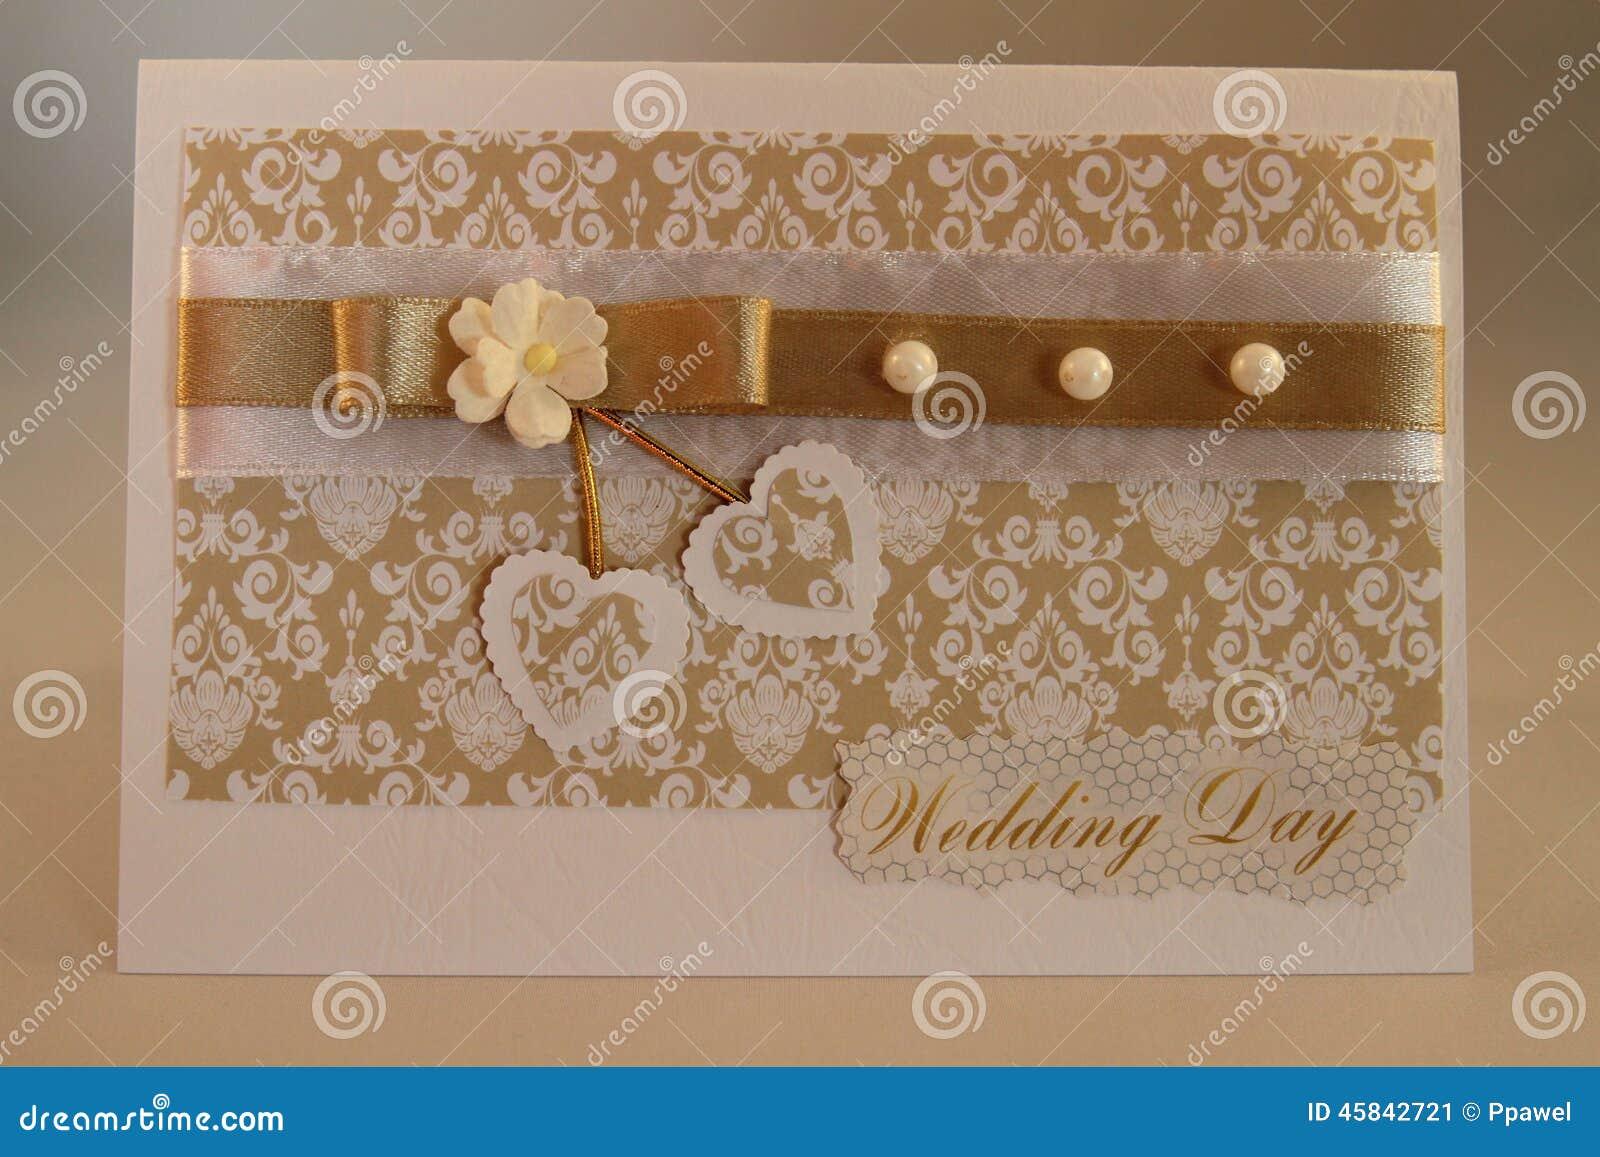 Handmade Card Stock Photo